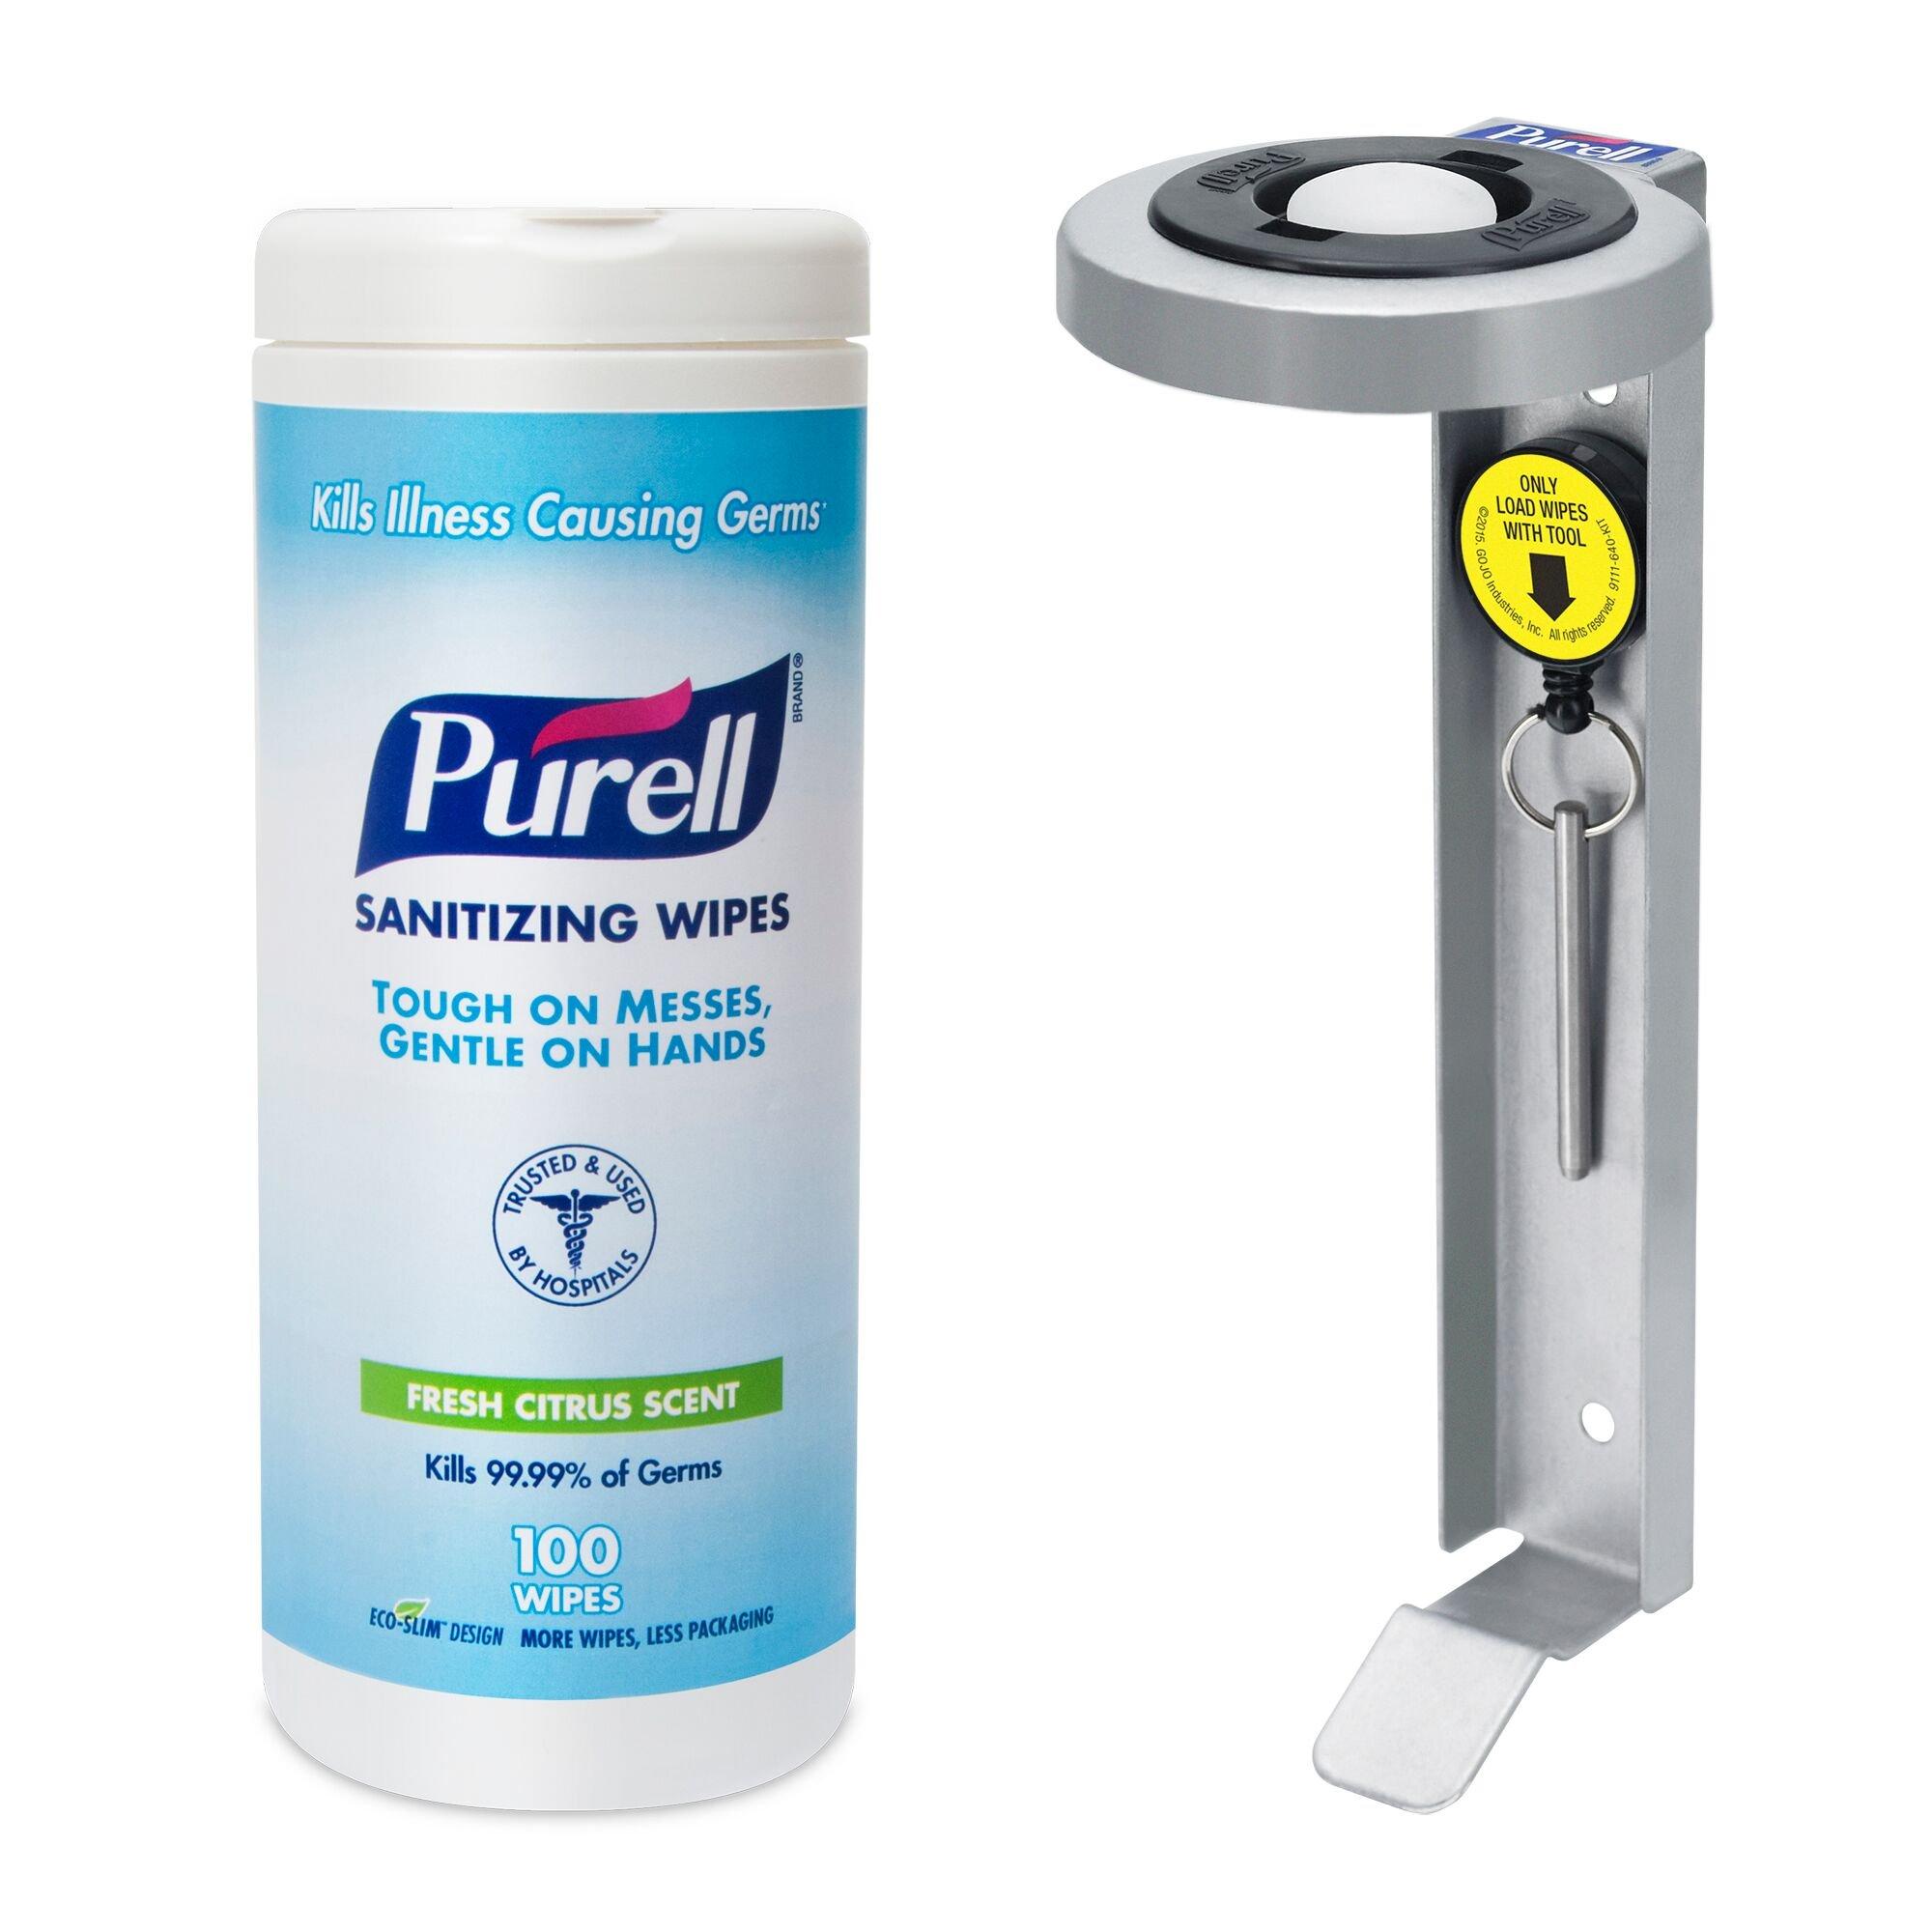 PURELL Hand Sanitizing Wipes - 100 Ct Bracket Kit